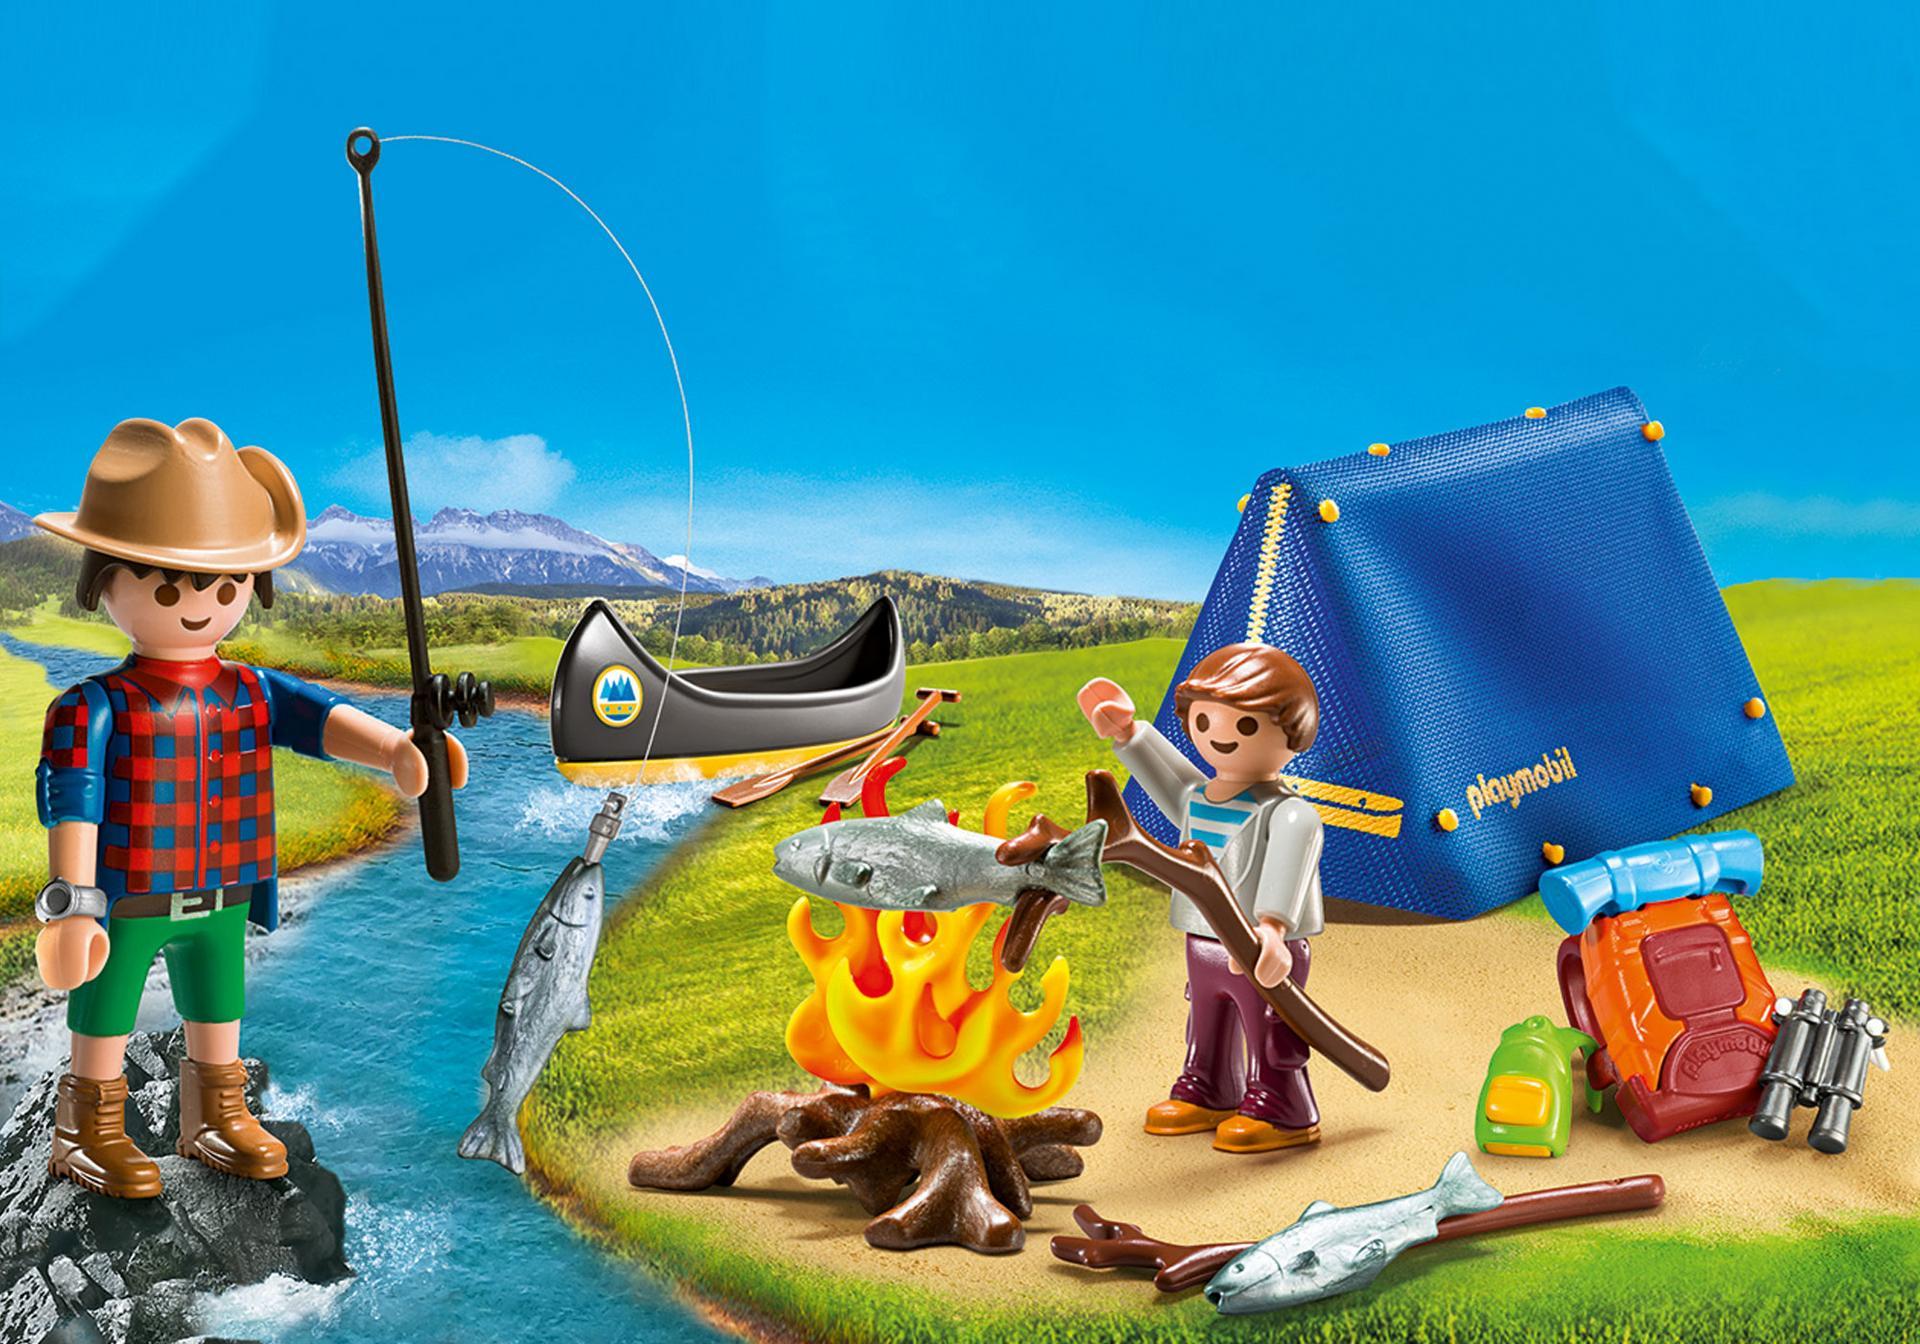 kart camping danmark Camping Adventure Carry Case   9323   PLAYMOBIL® USA kart camping danmark